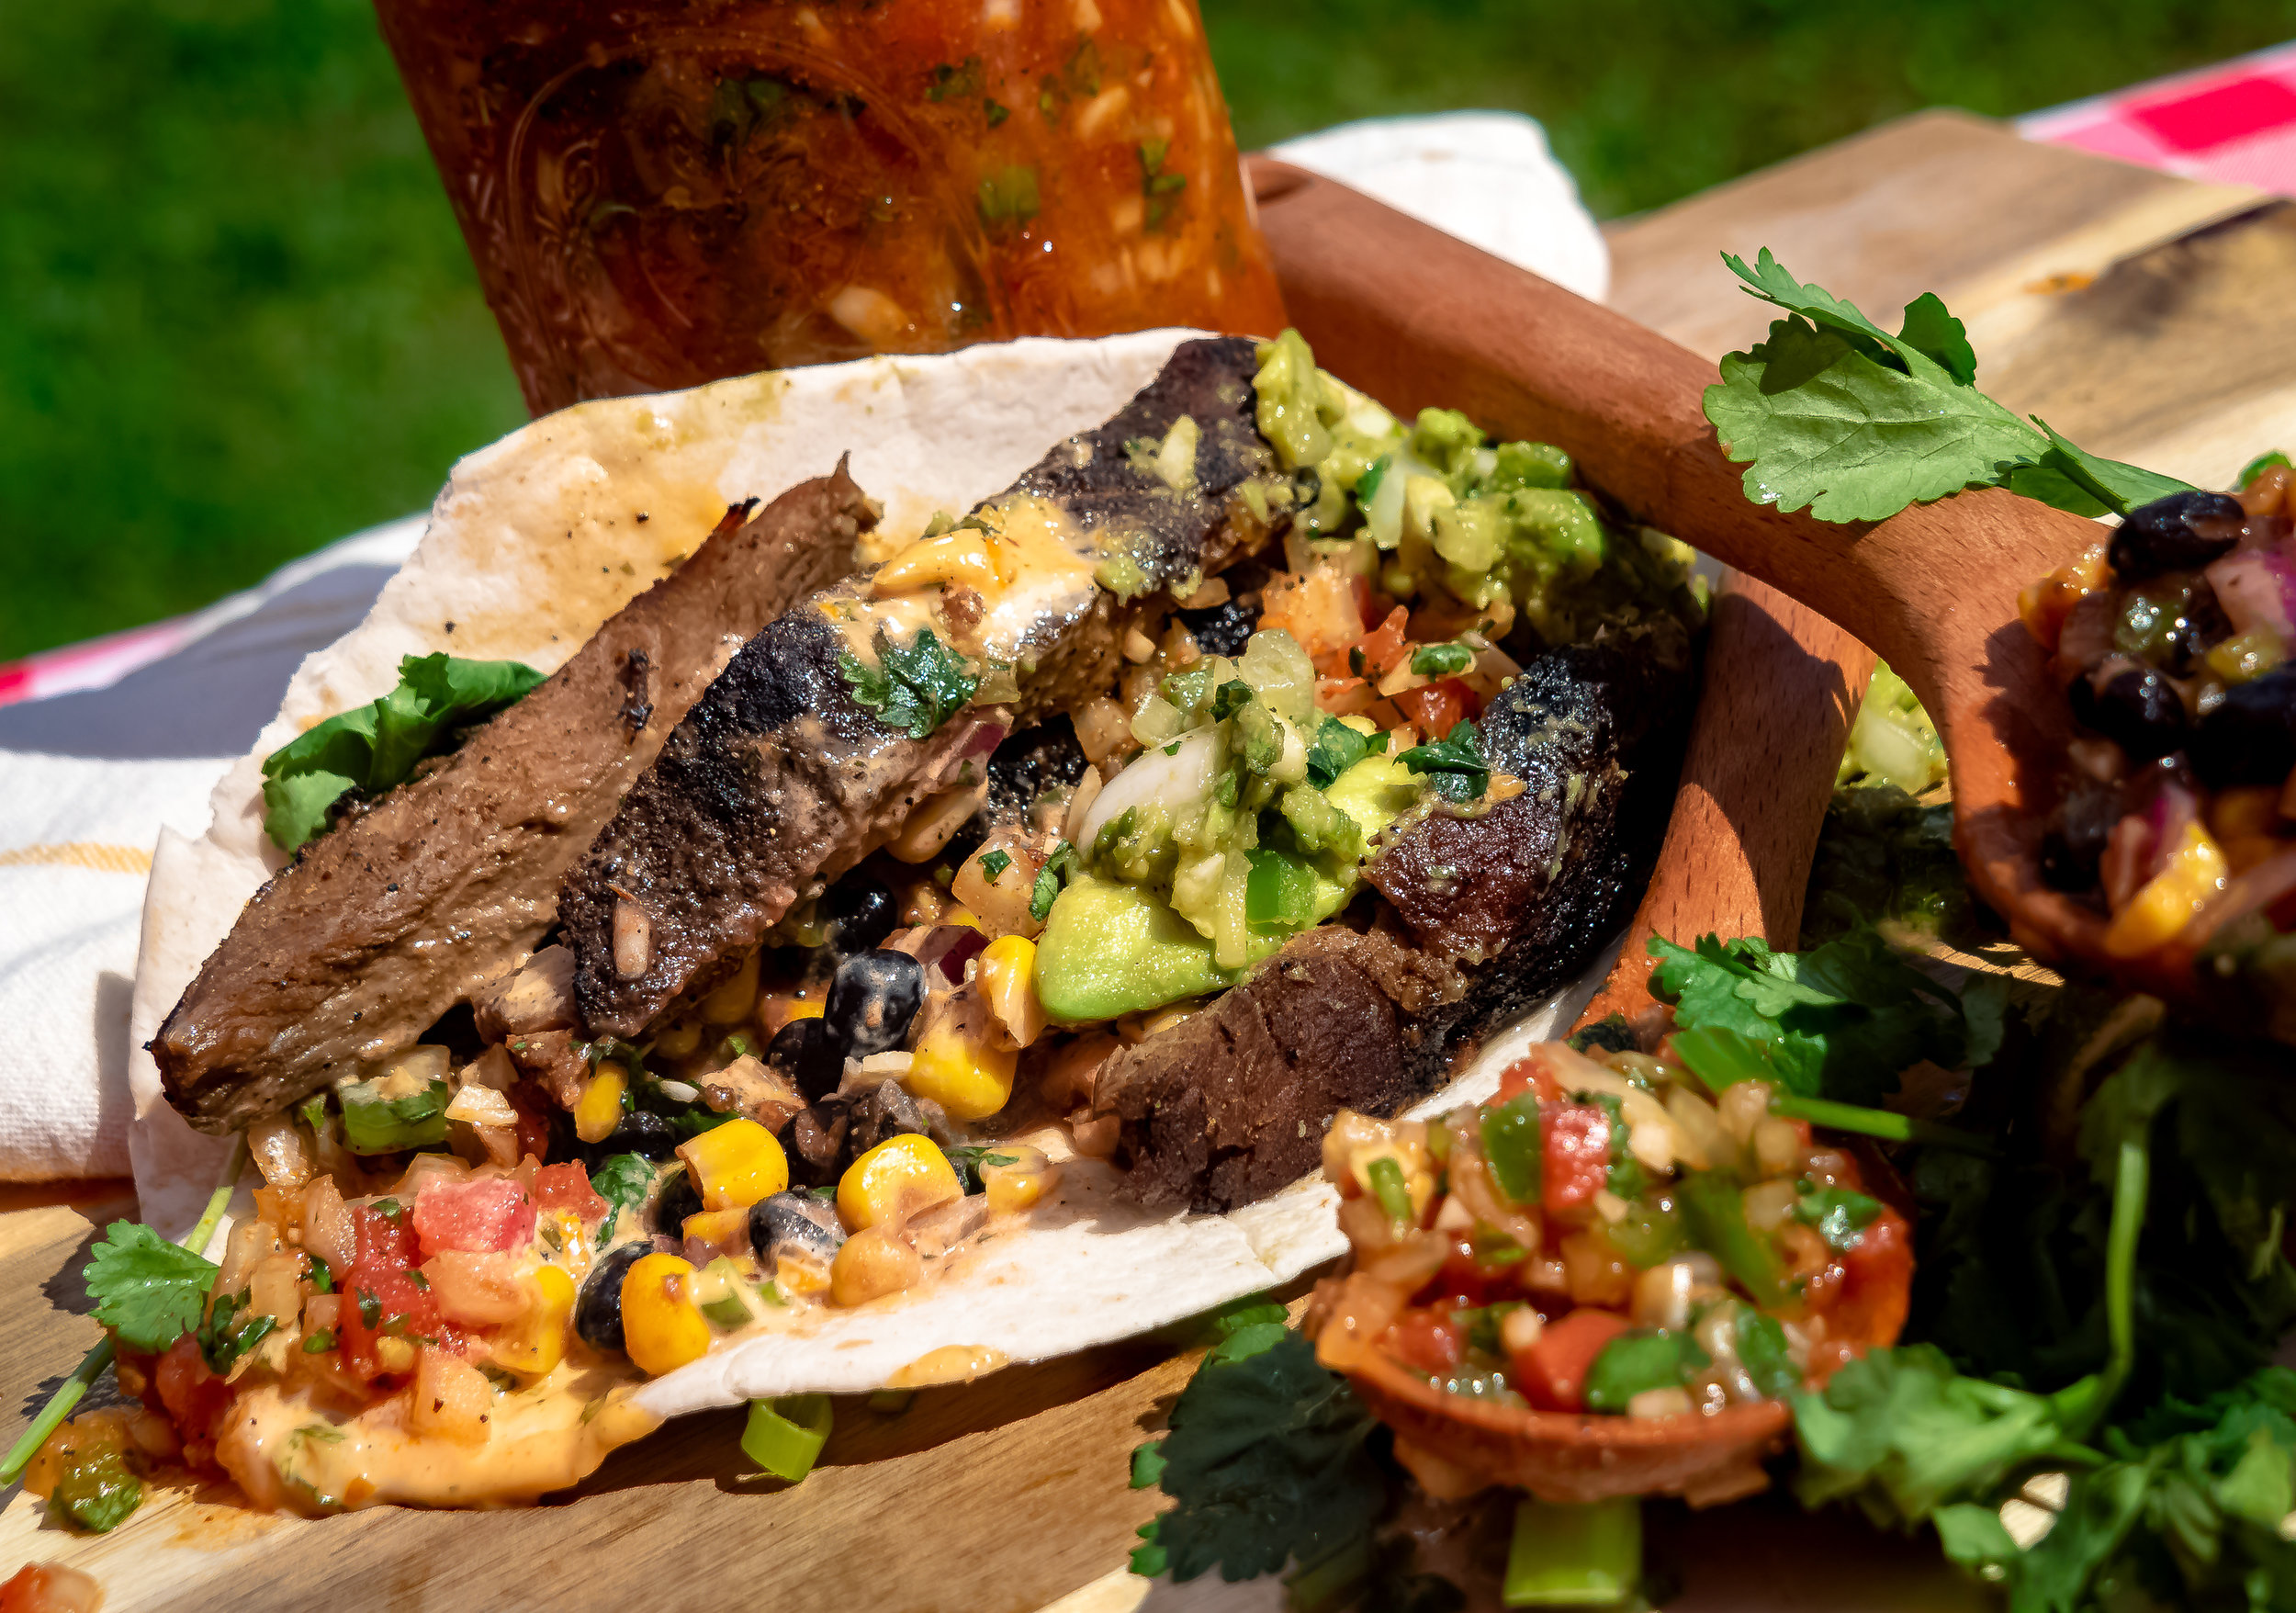 Carnitas Tacos - A Taste You Won't Forget